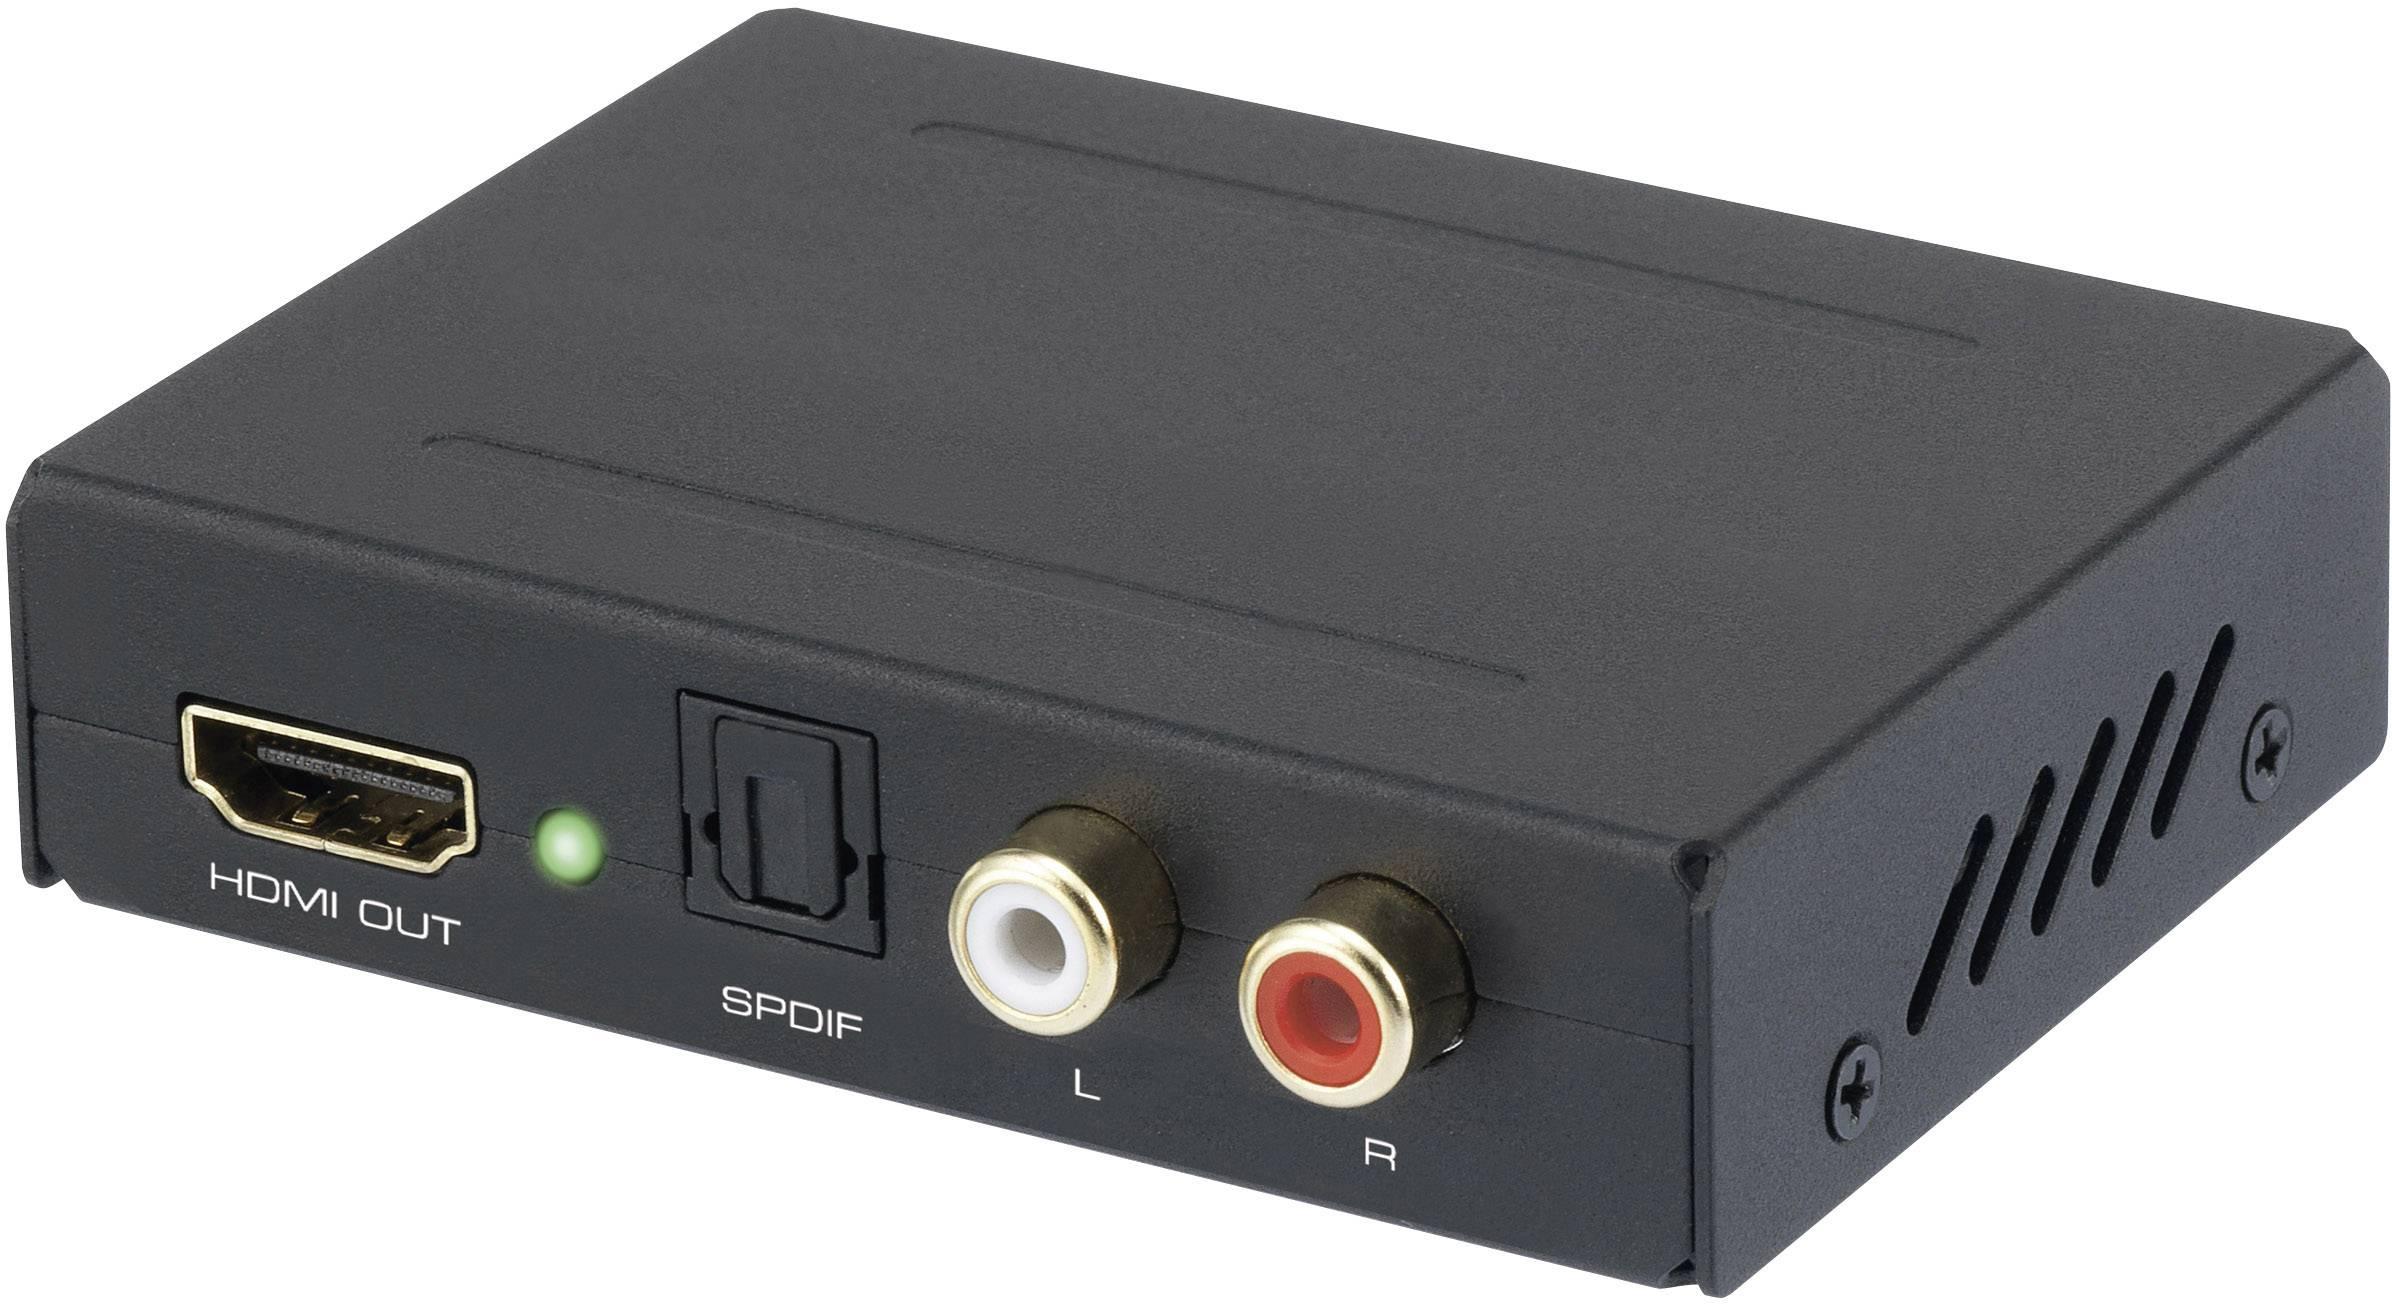 HDMI audio extraktor UHD (4K) SpeaKa Professional 29063c25